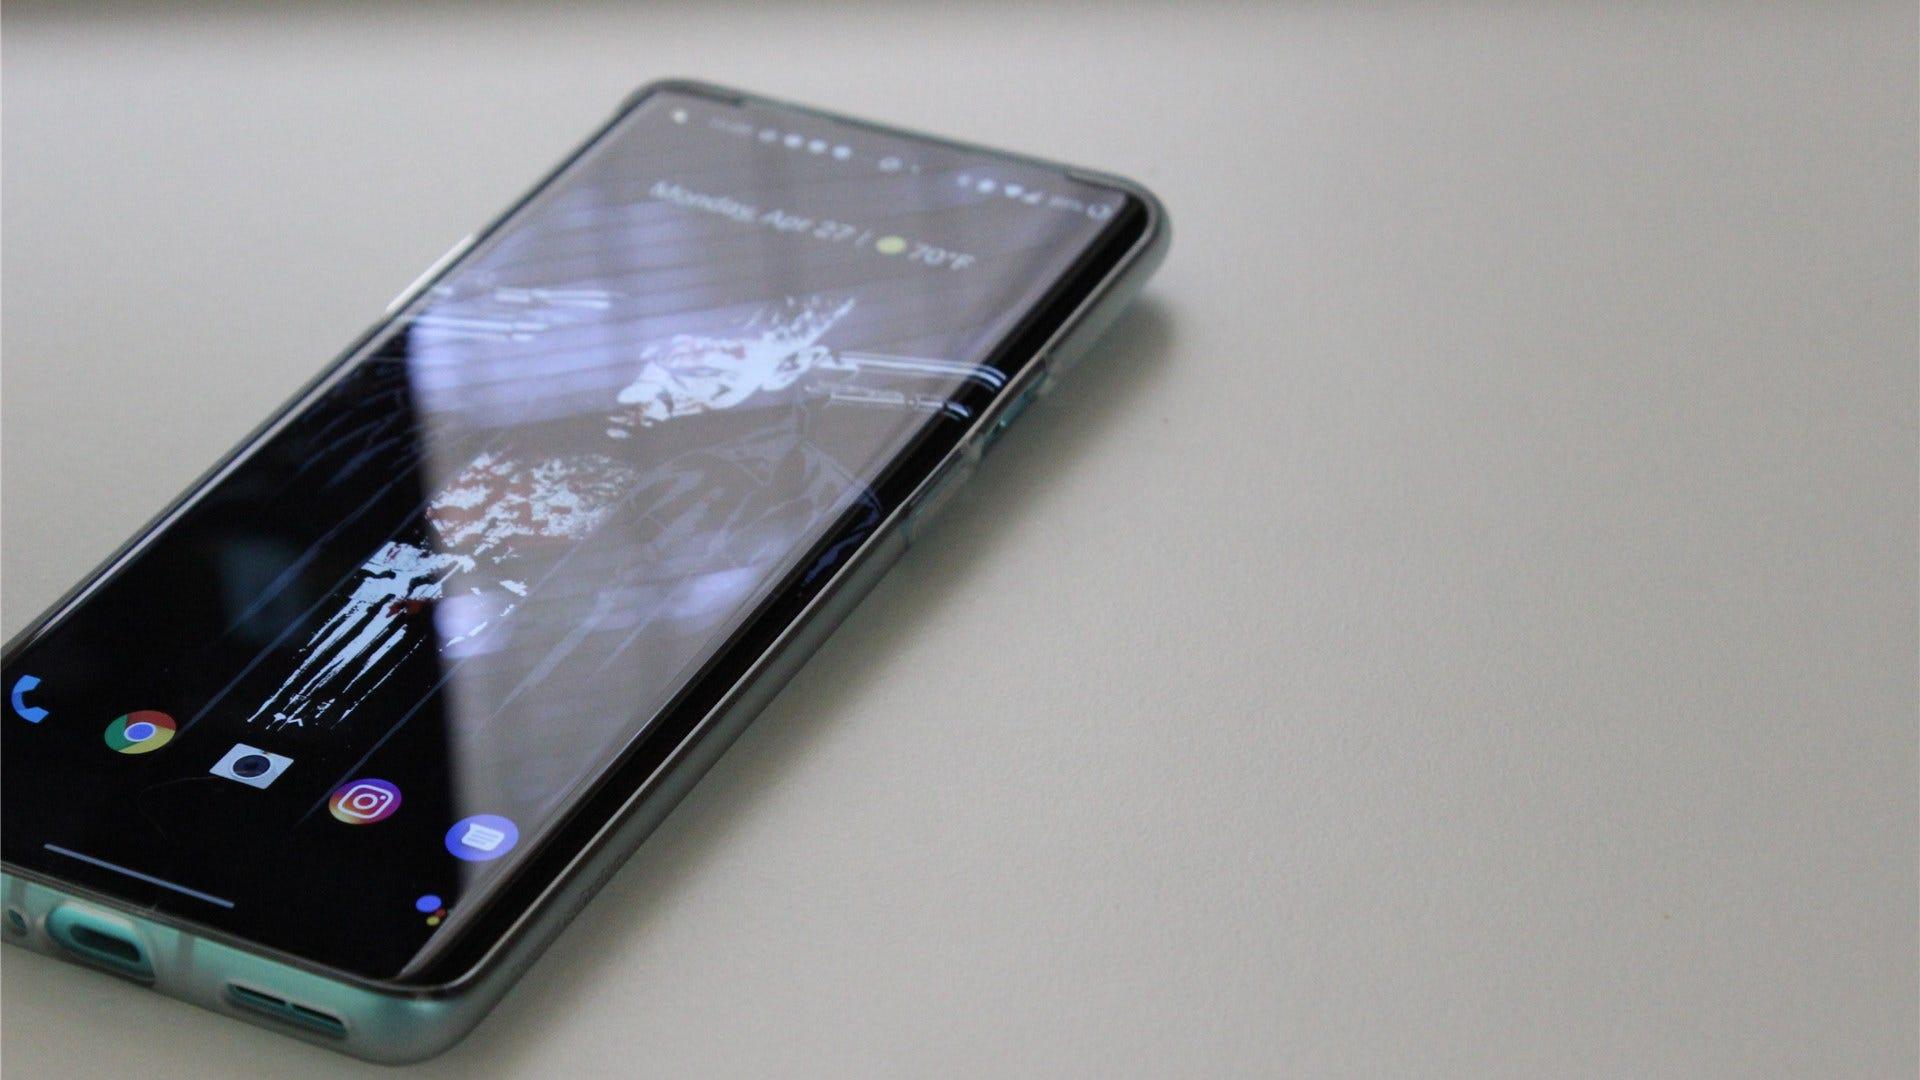 OnePlus 8 Pro lying on a white desk